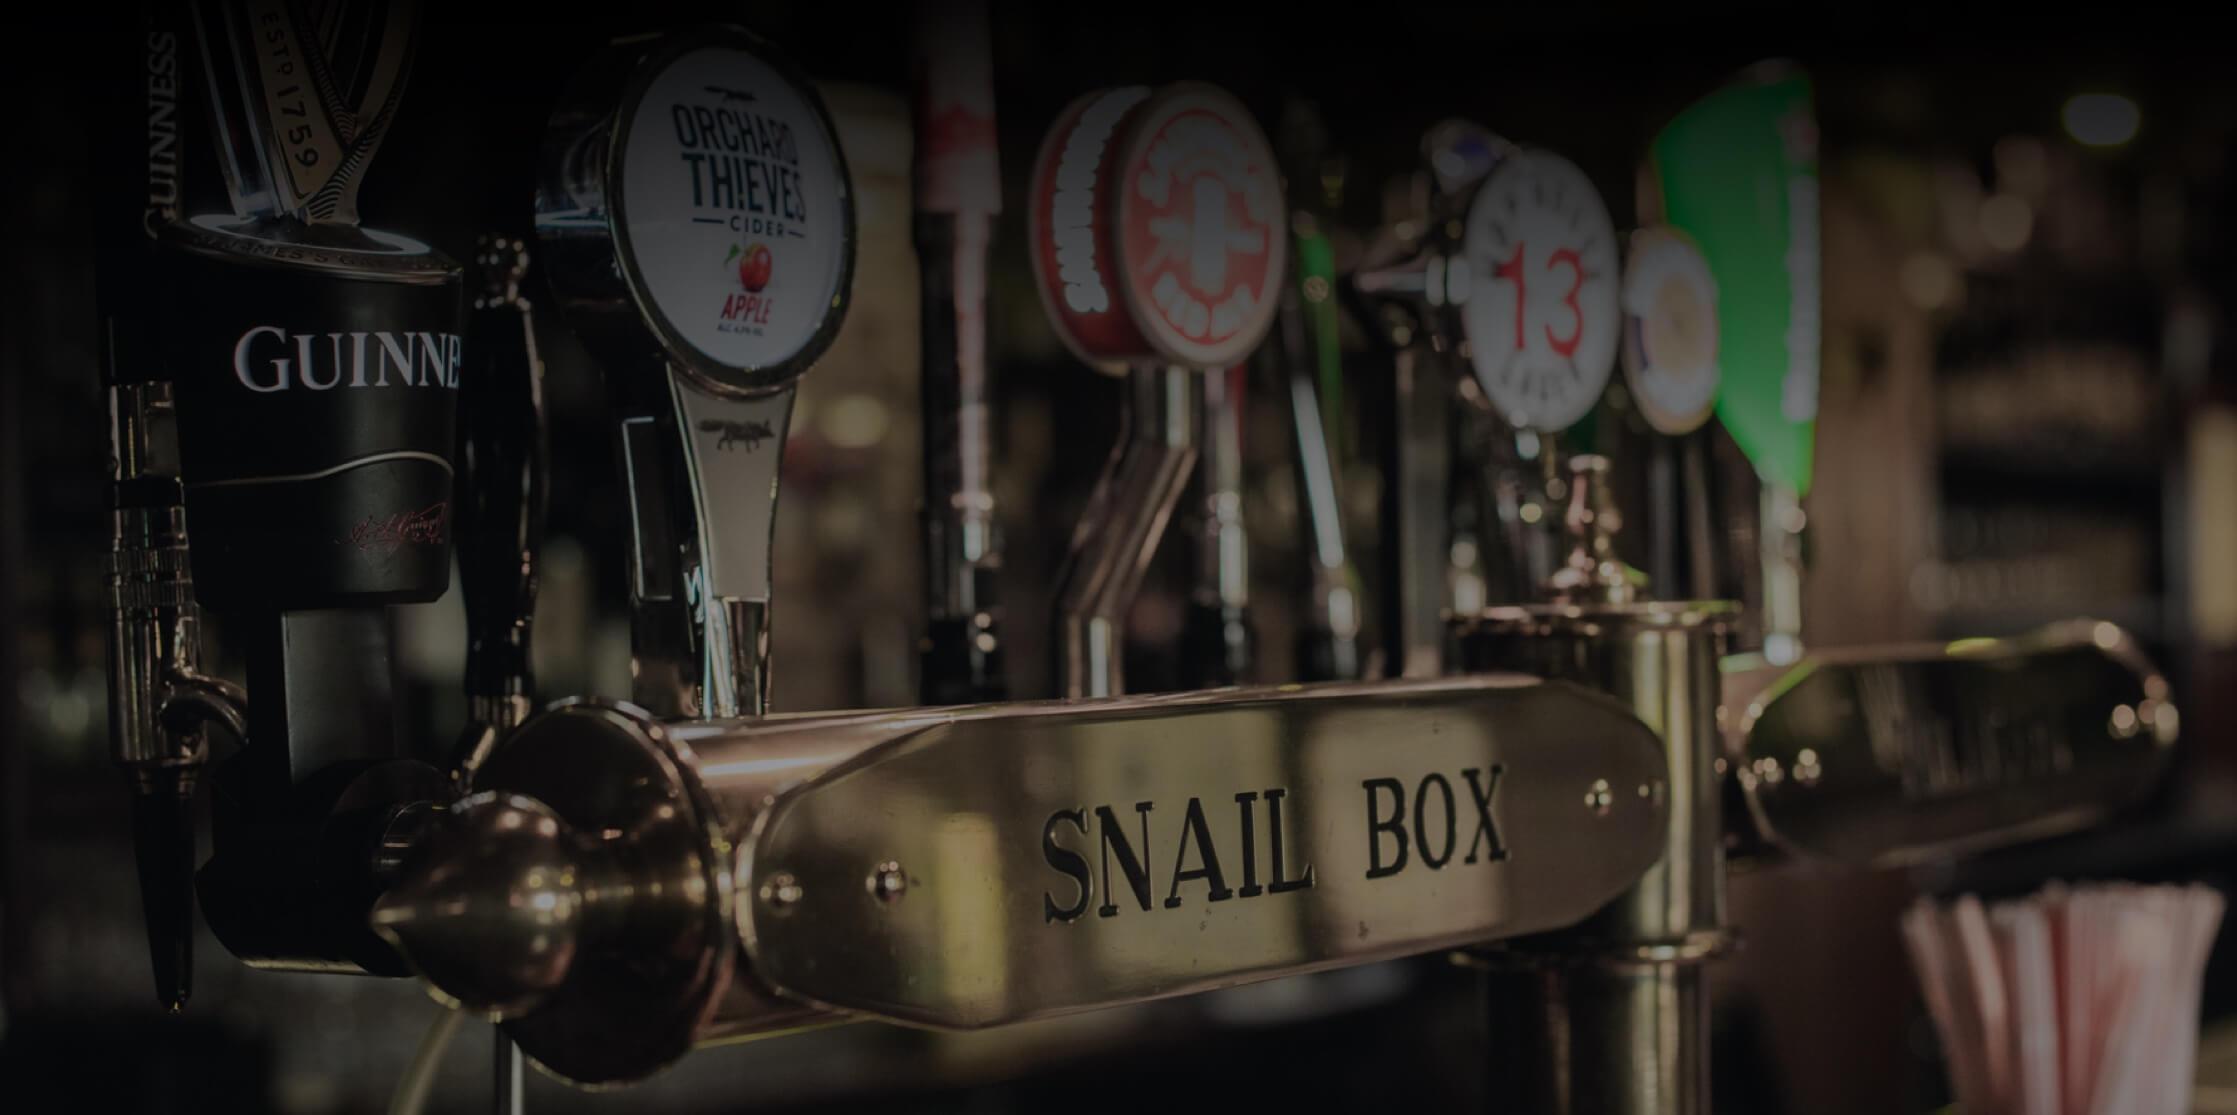 The Snailbox Bar